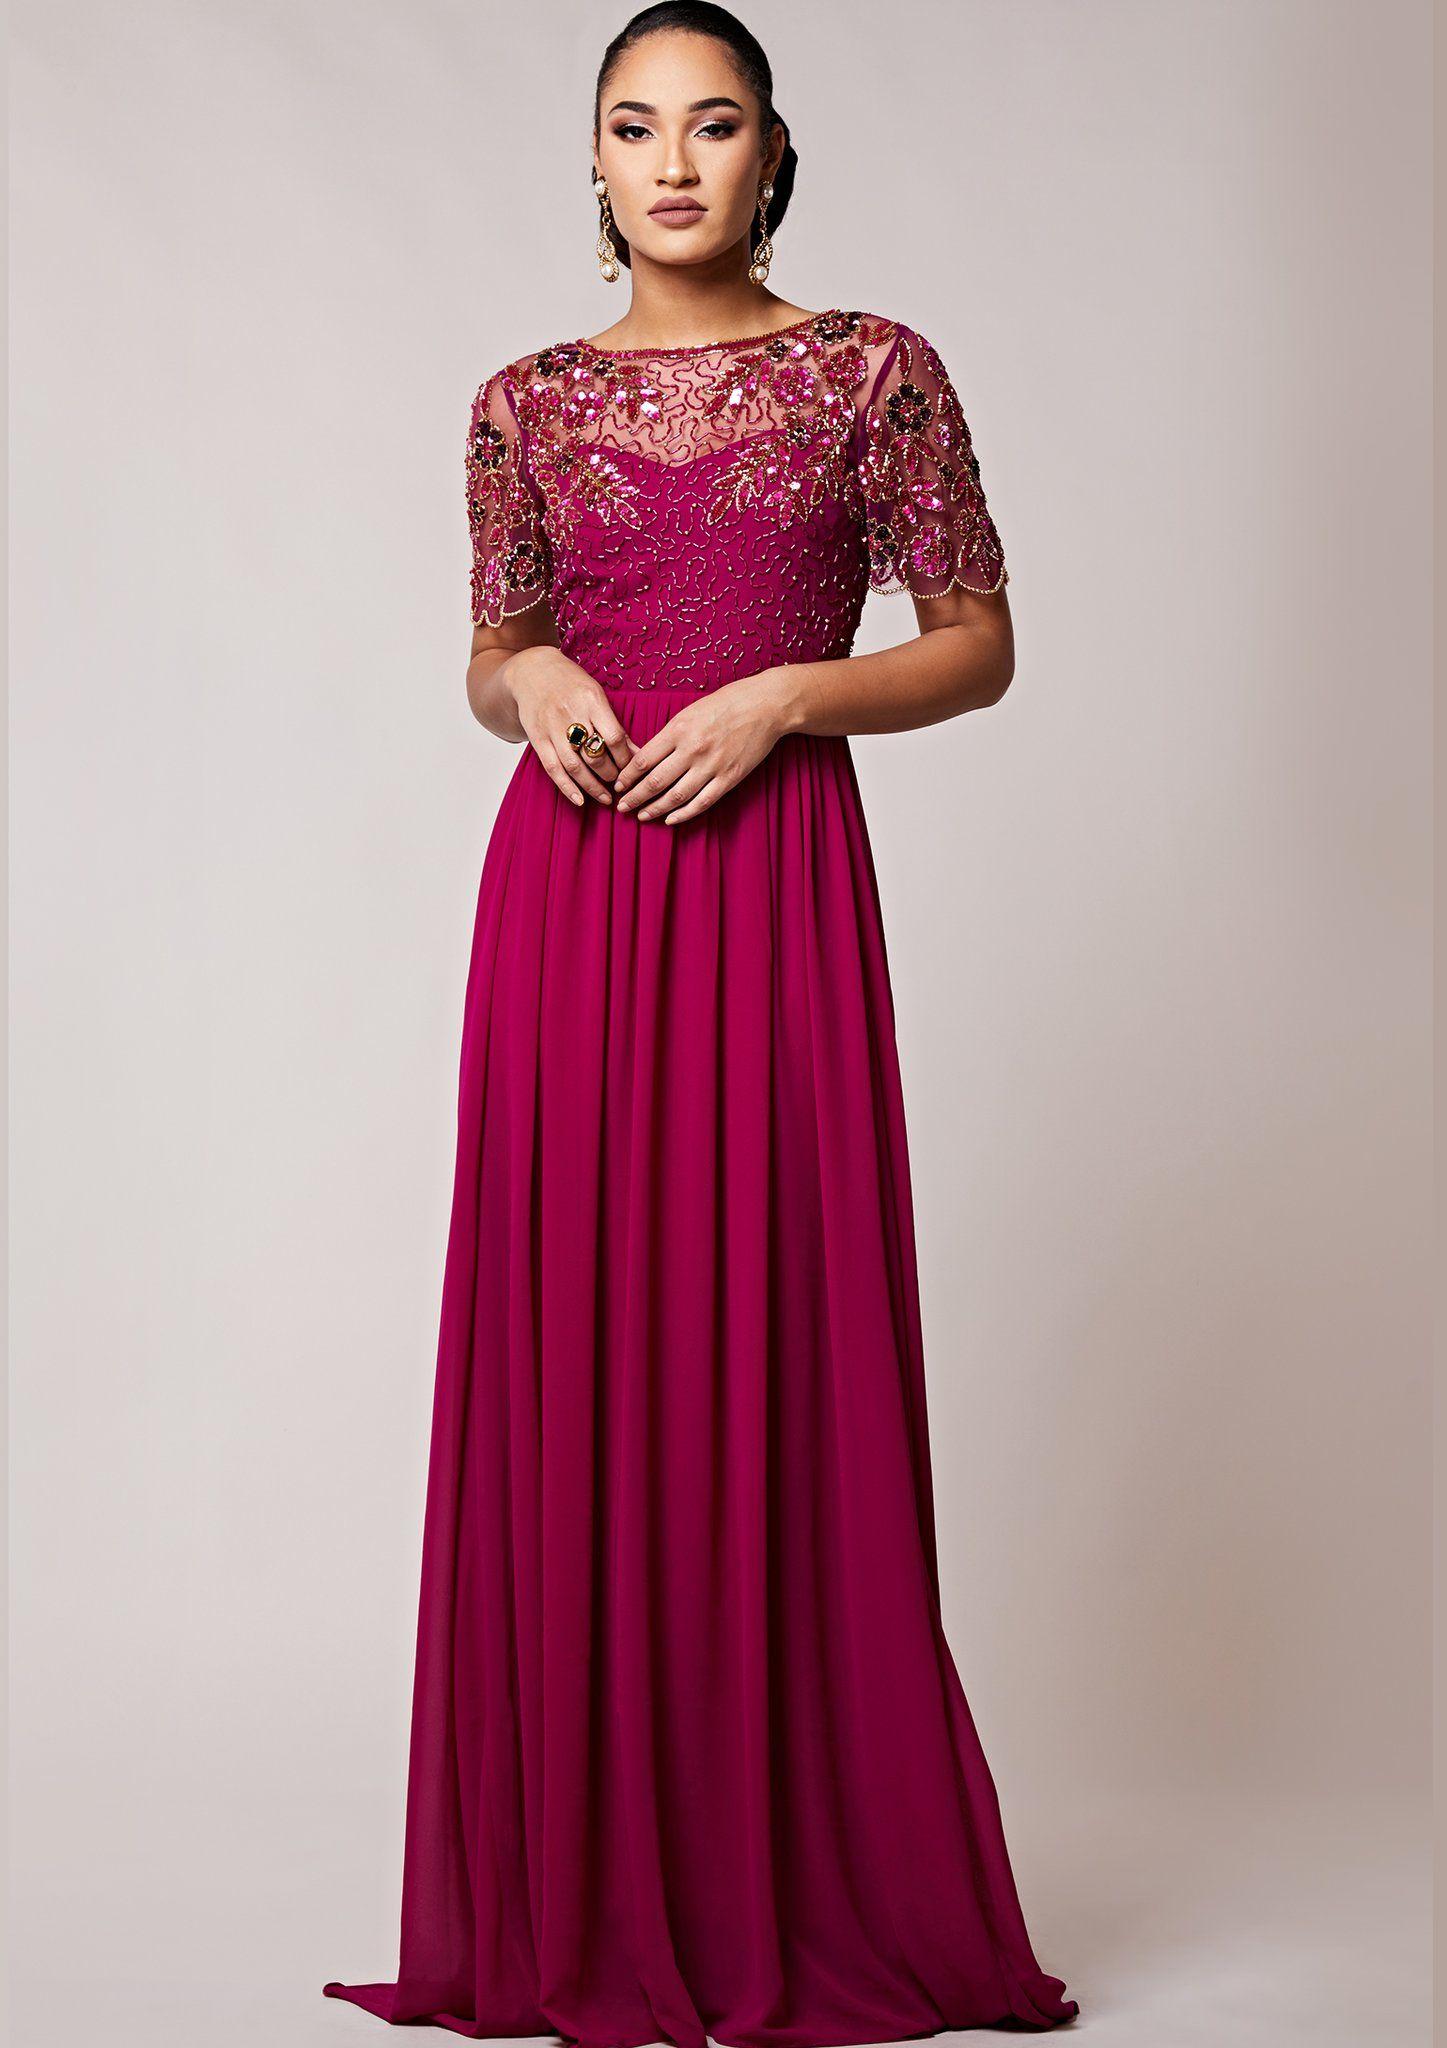 de6838d3f26 Rahaya Dress Berry in 2018